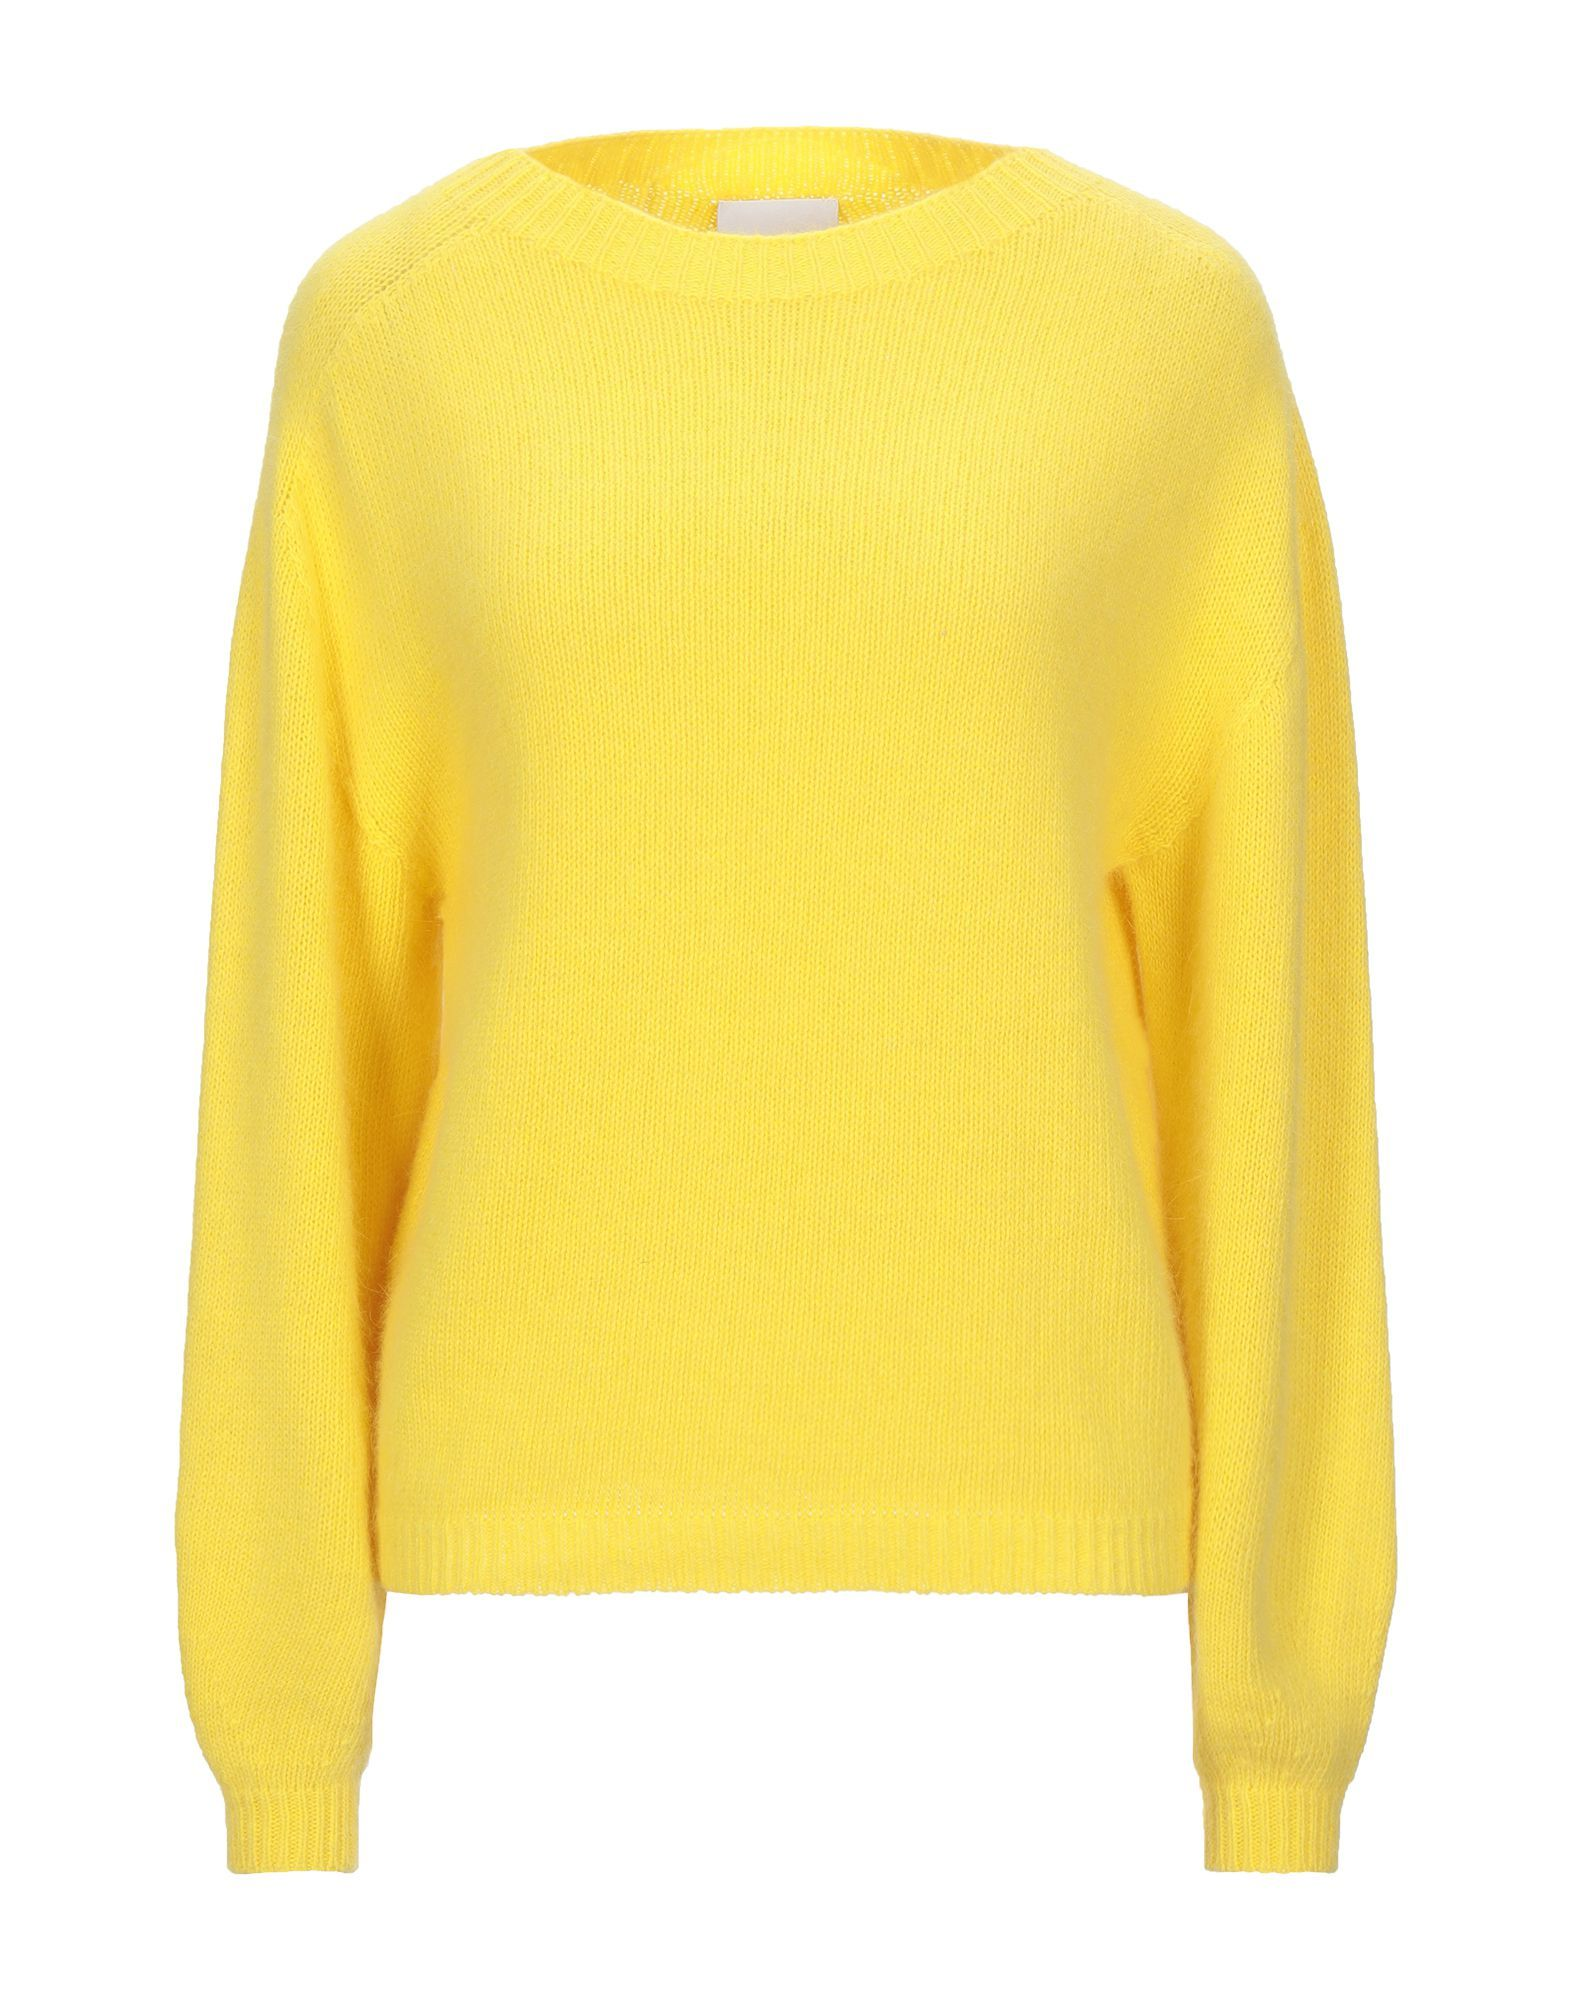 Annarita N Twenty 4H Yellow Angora Lightweight Knit Jumper